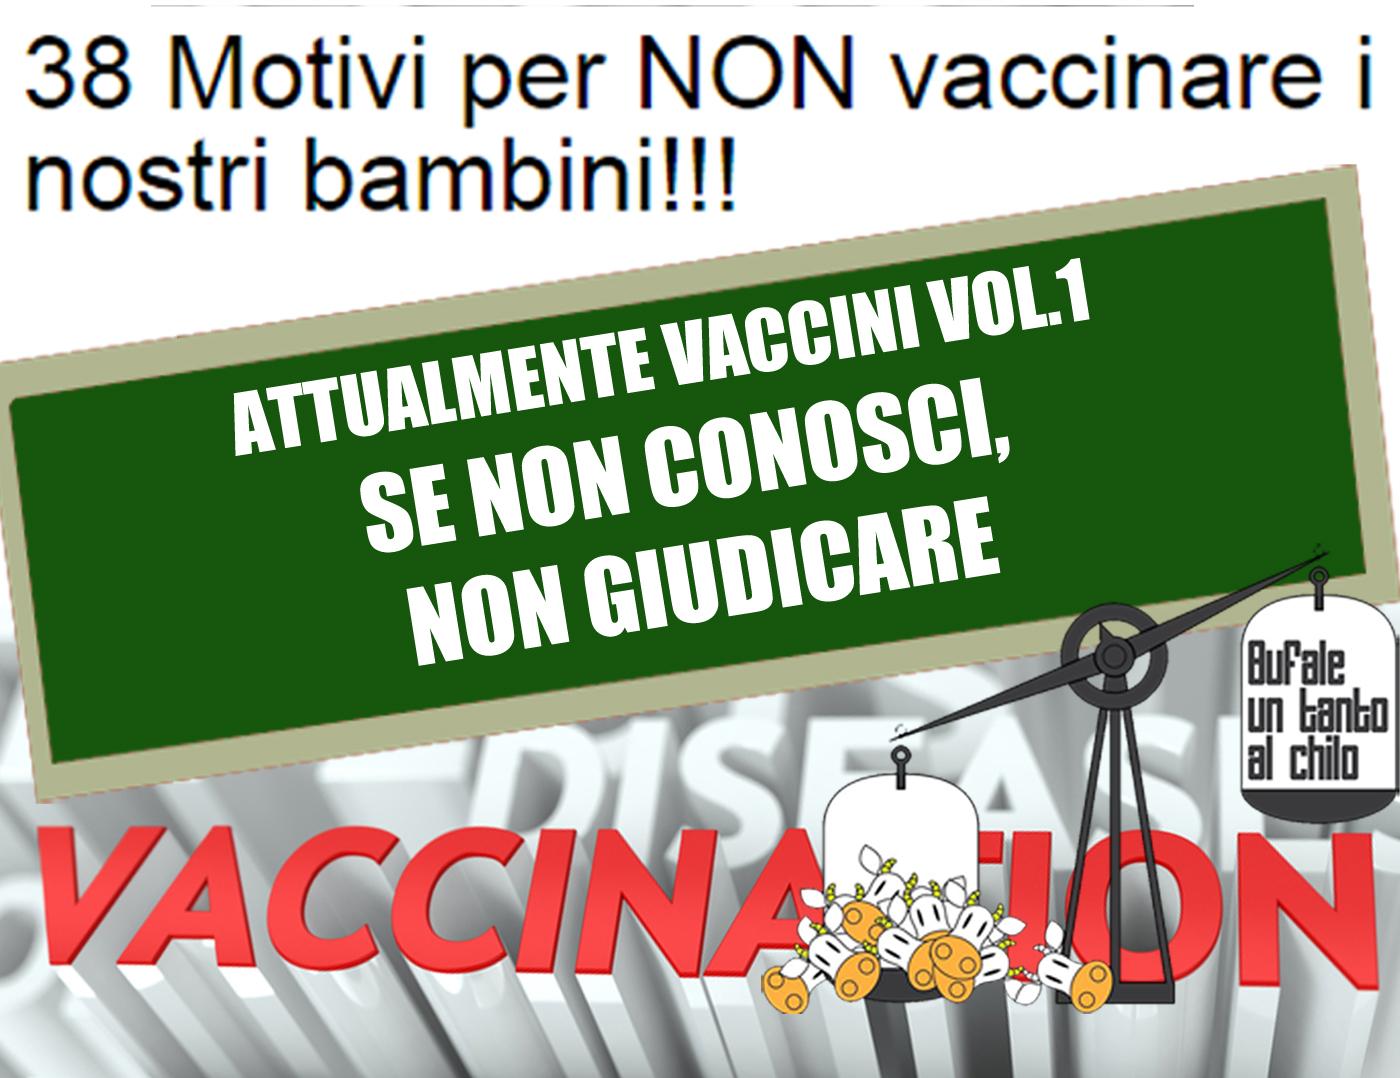 vaccini-38motivi-vol1